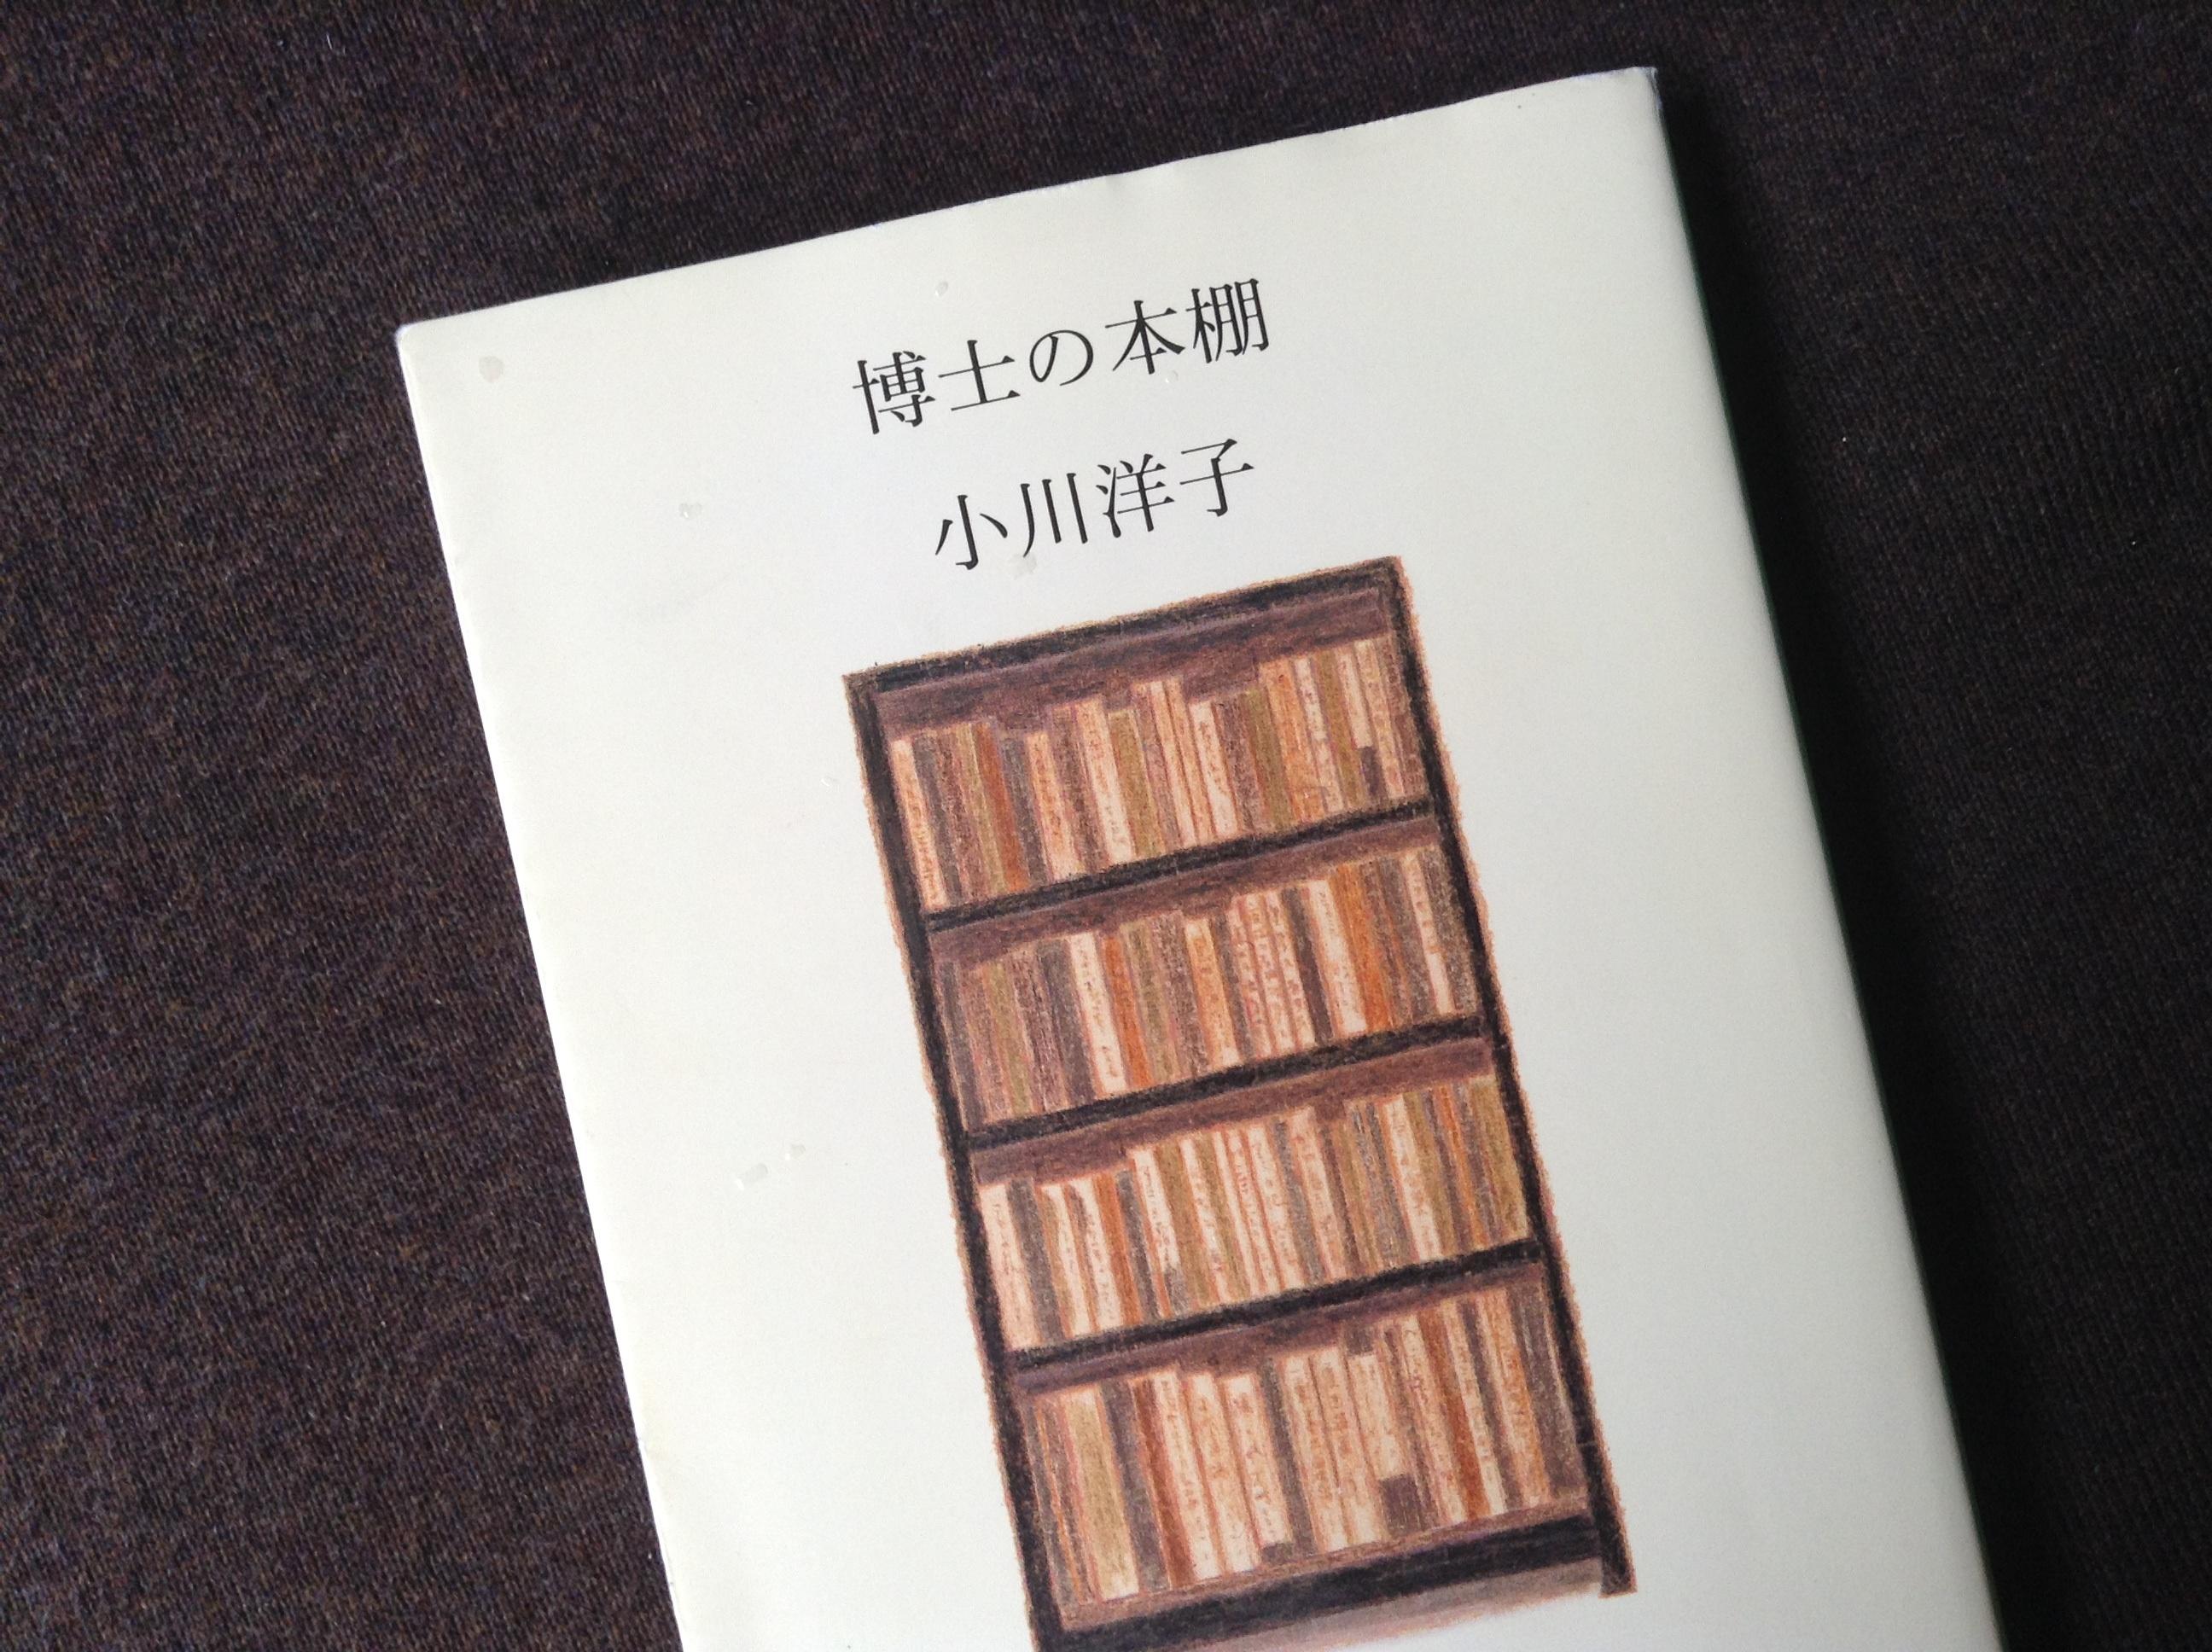 http://eizo.admi.co.jp/image.jpg